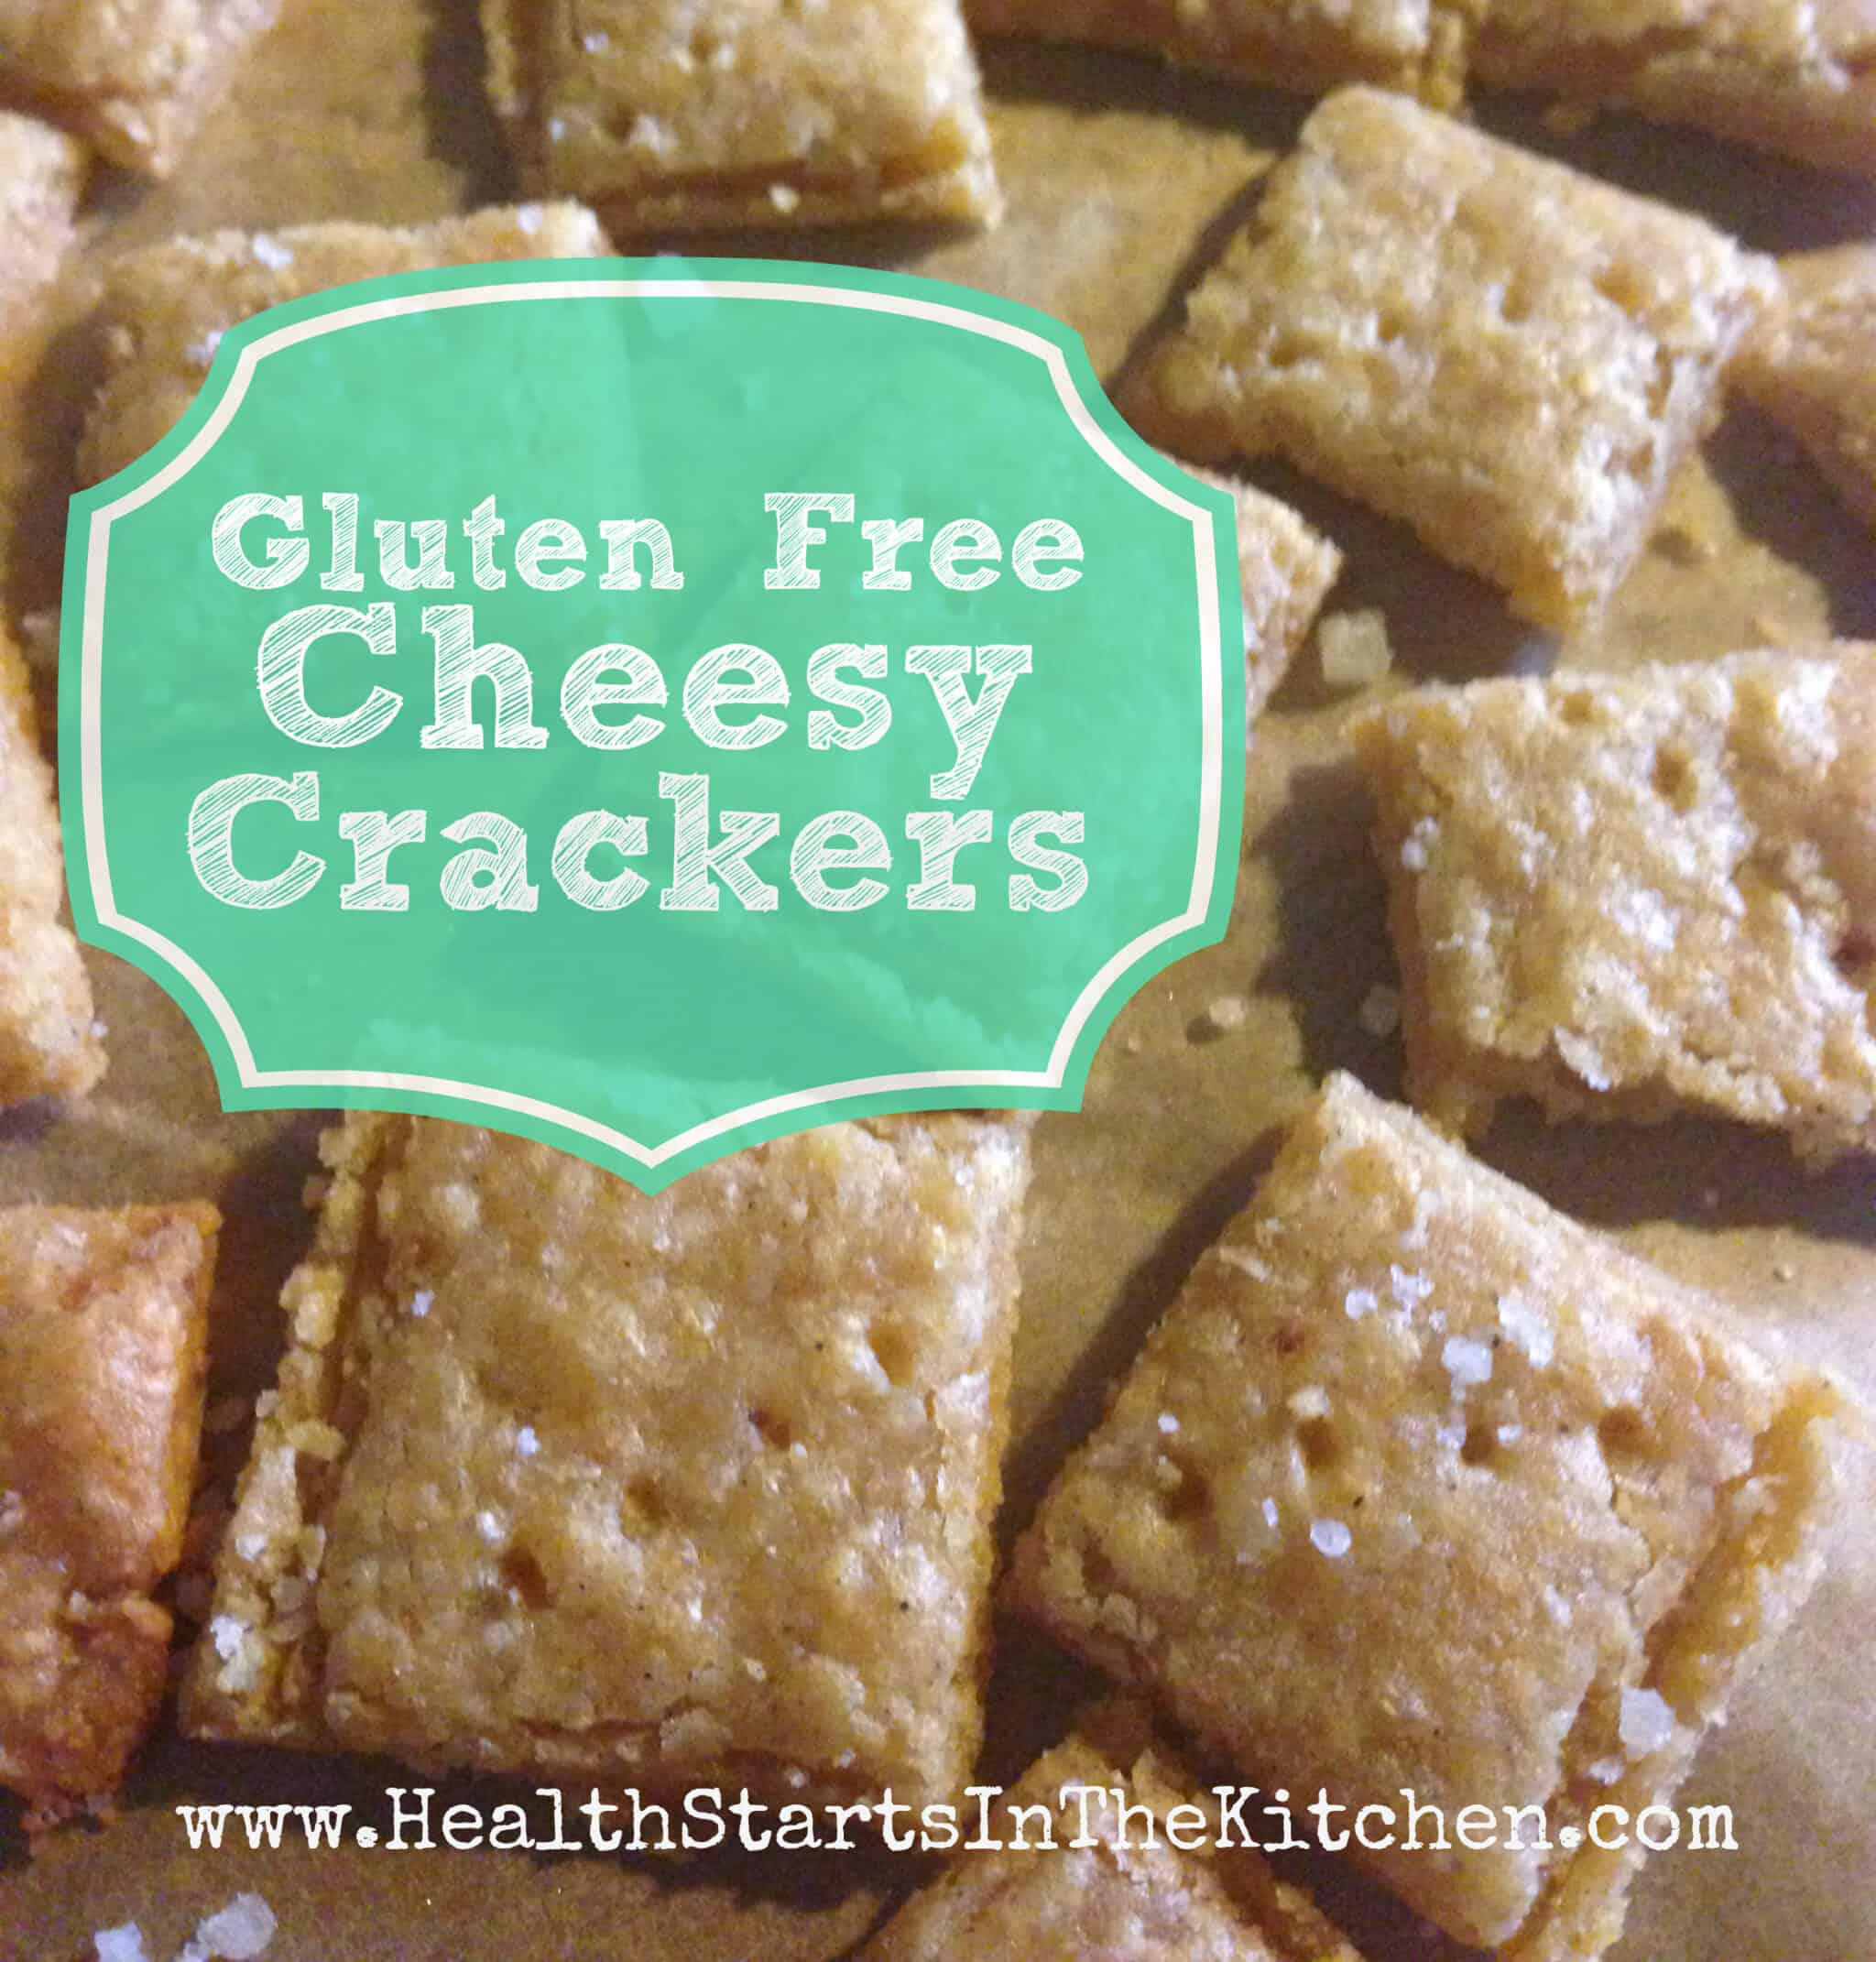 Amazing Gluten Free Cheesy Crackers